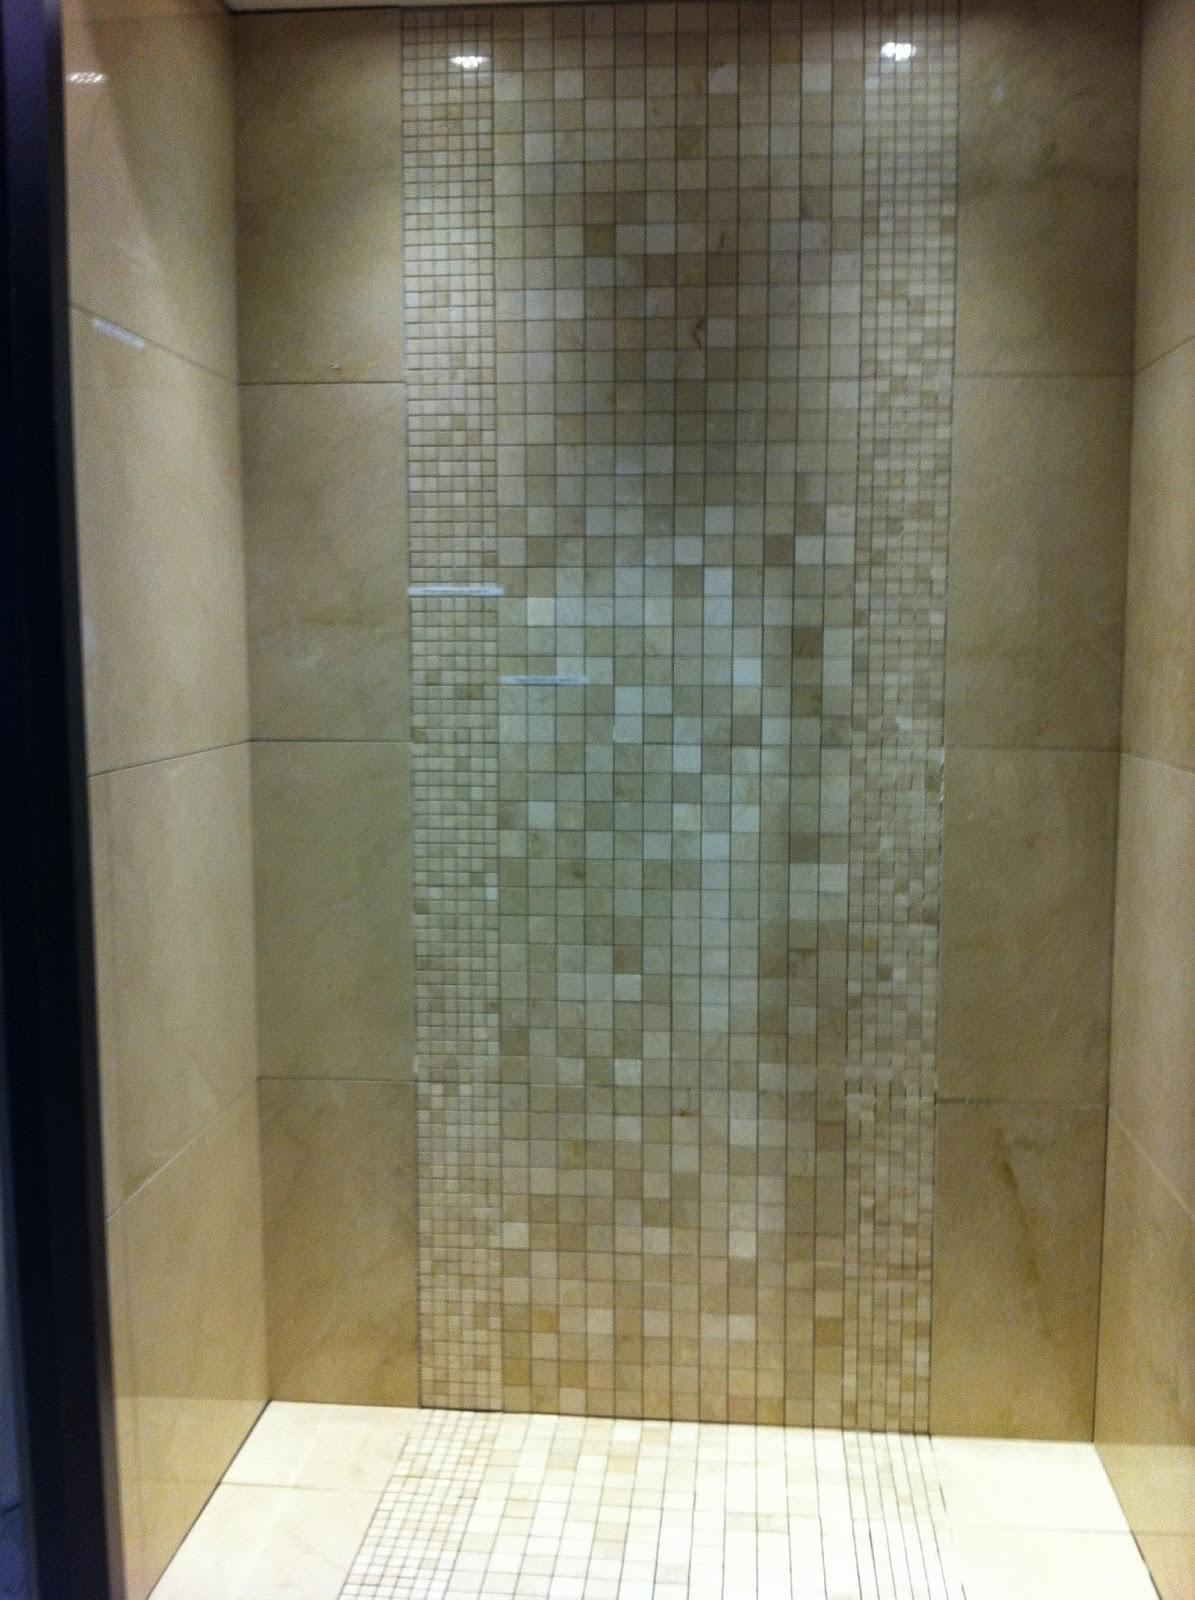 To Da Loos Crema Marfil Tiles A Pretty Amp Simple Design